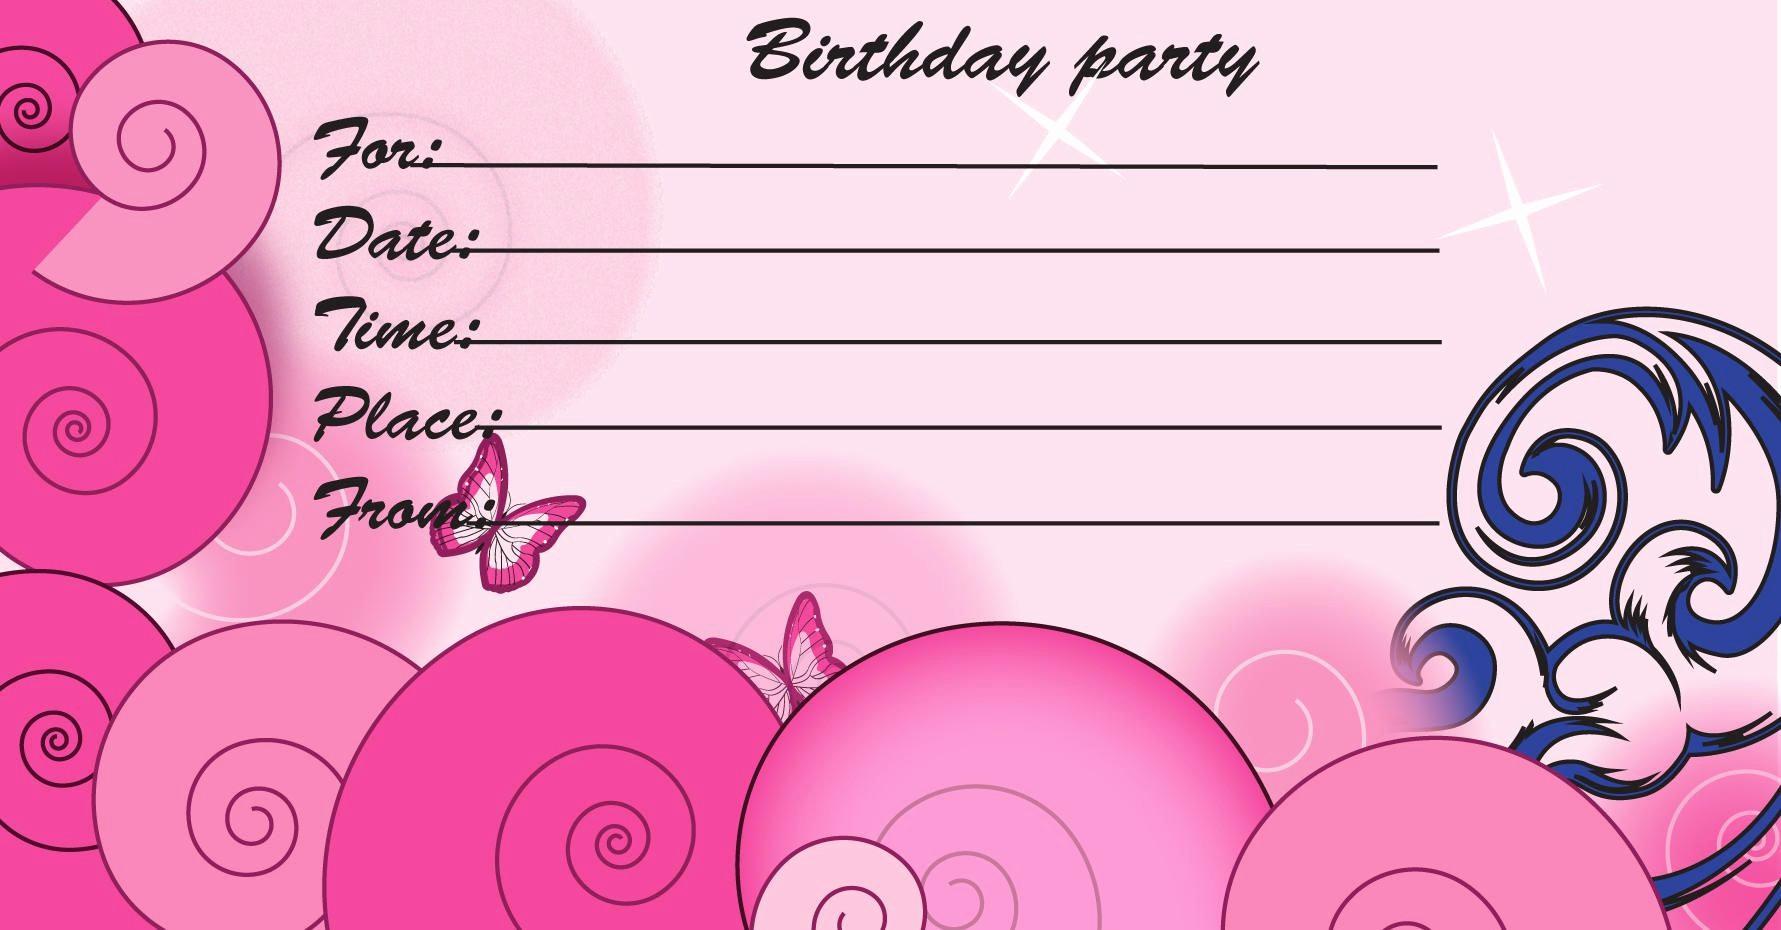 Birthday Party Invitation Card Template Fresh Birthday Invitations Kids Birthday Invite Template